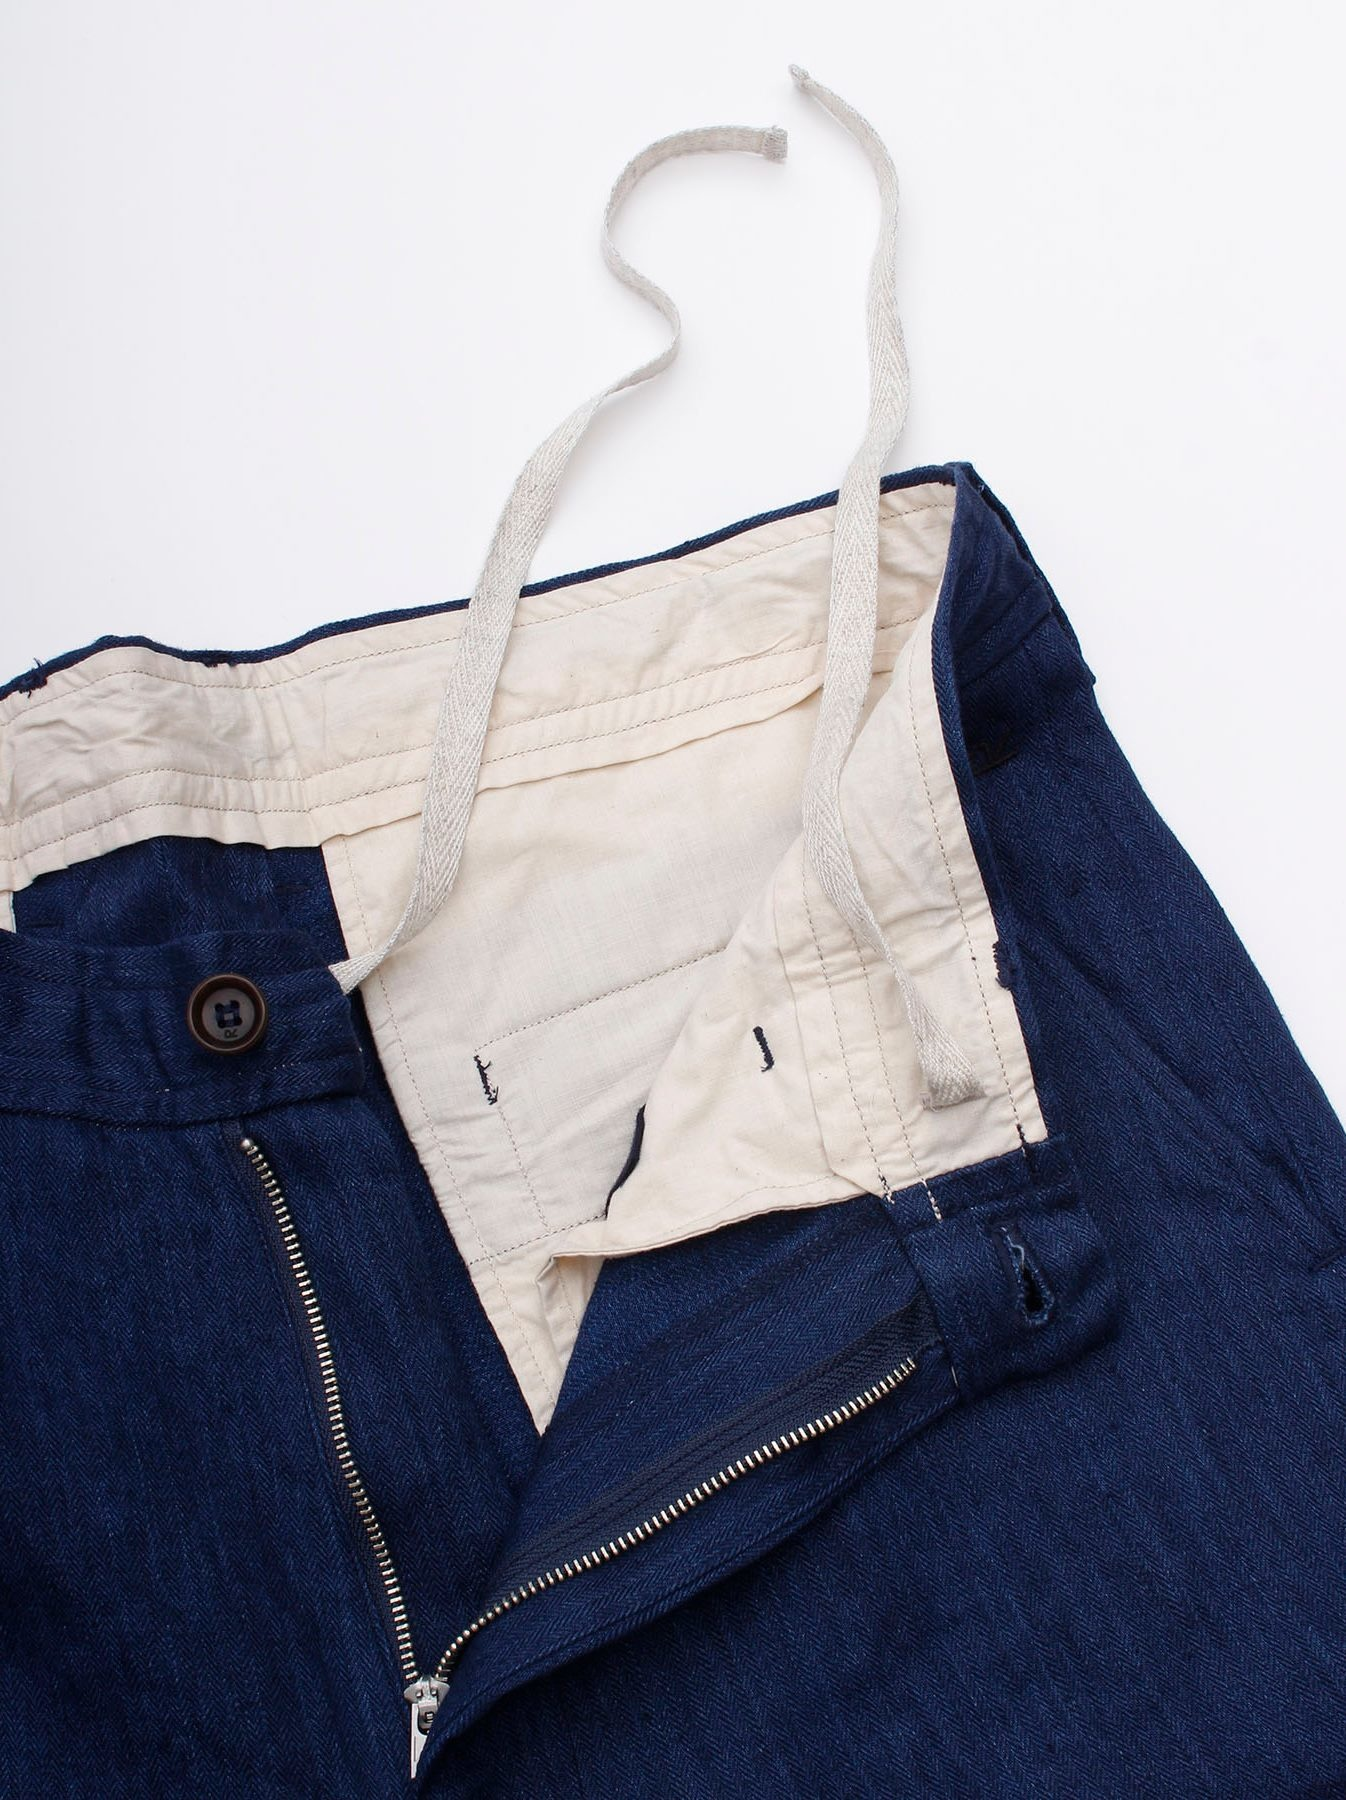 WH Indigo Linen Easy Slacks-6